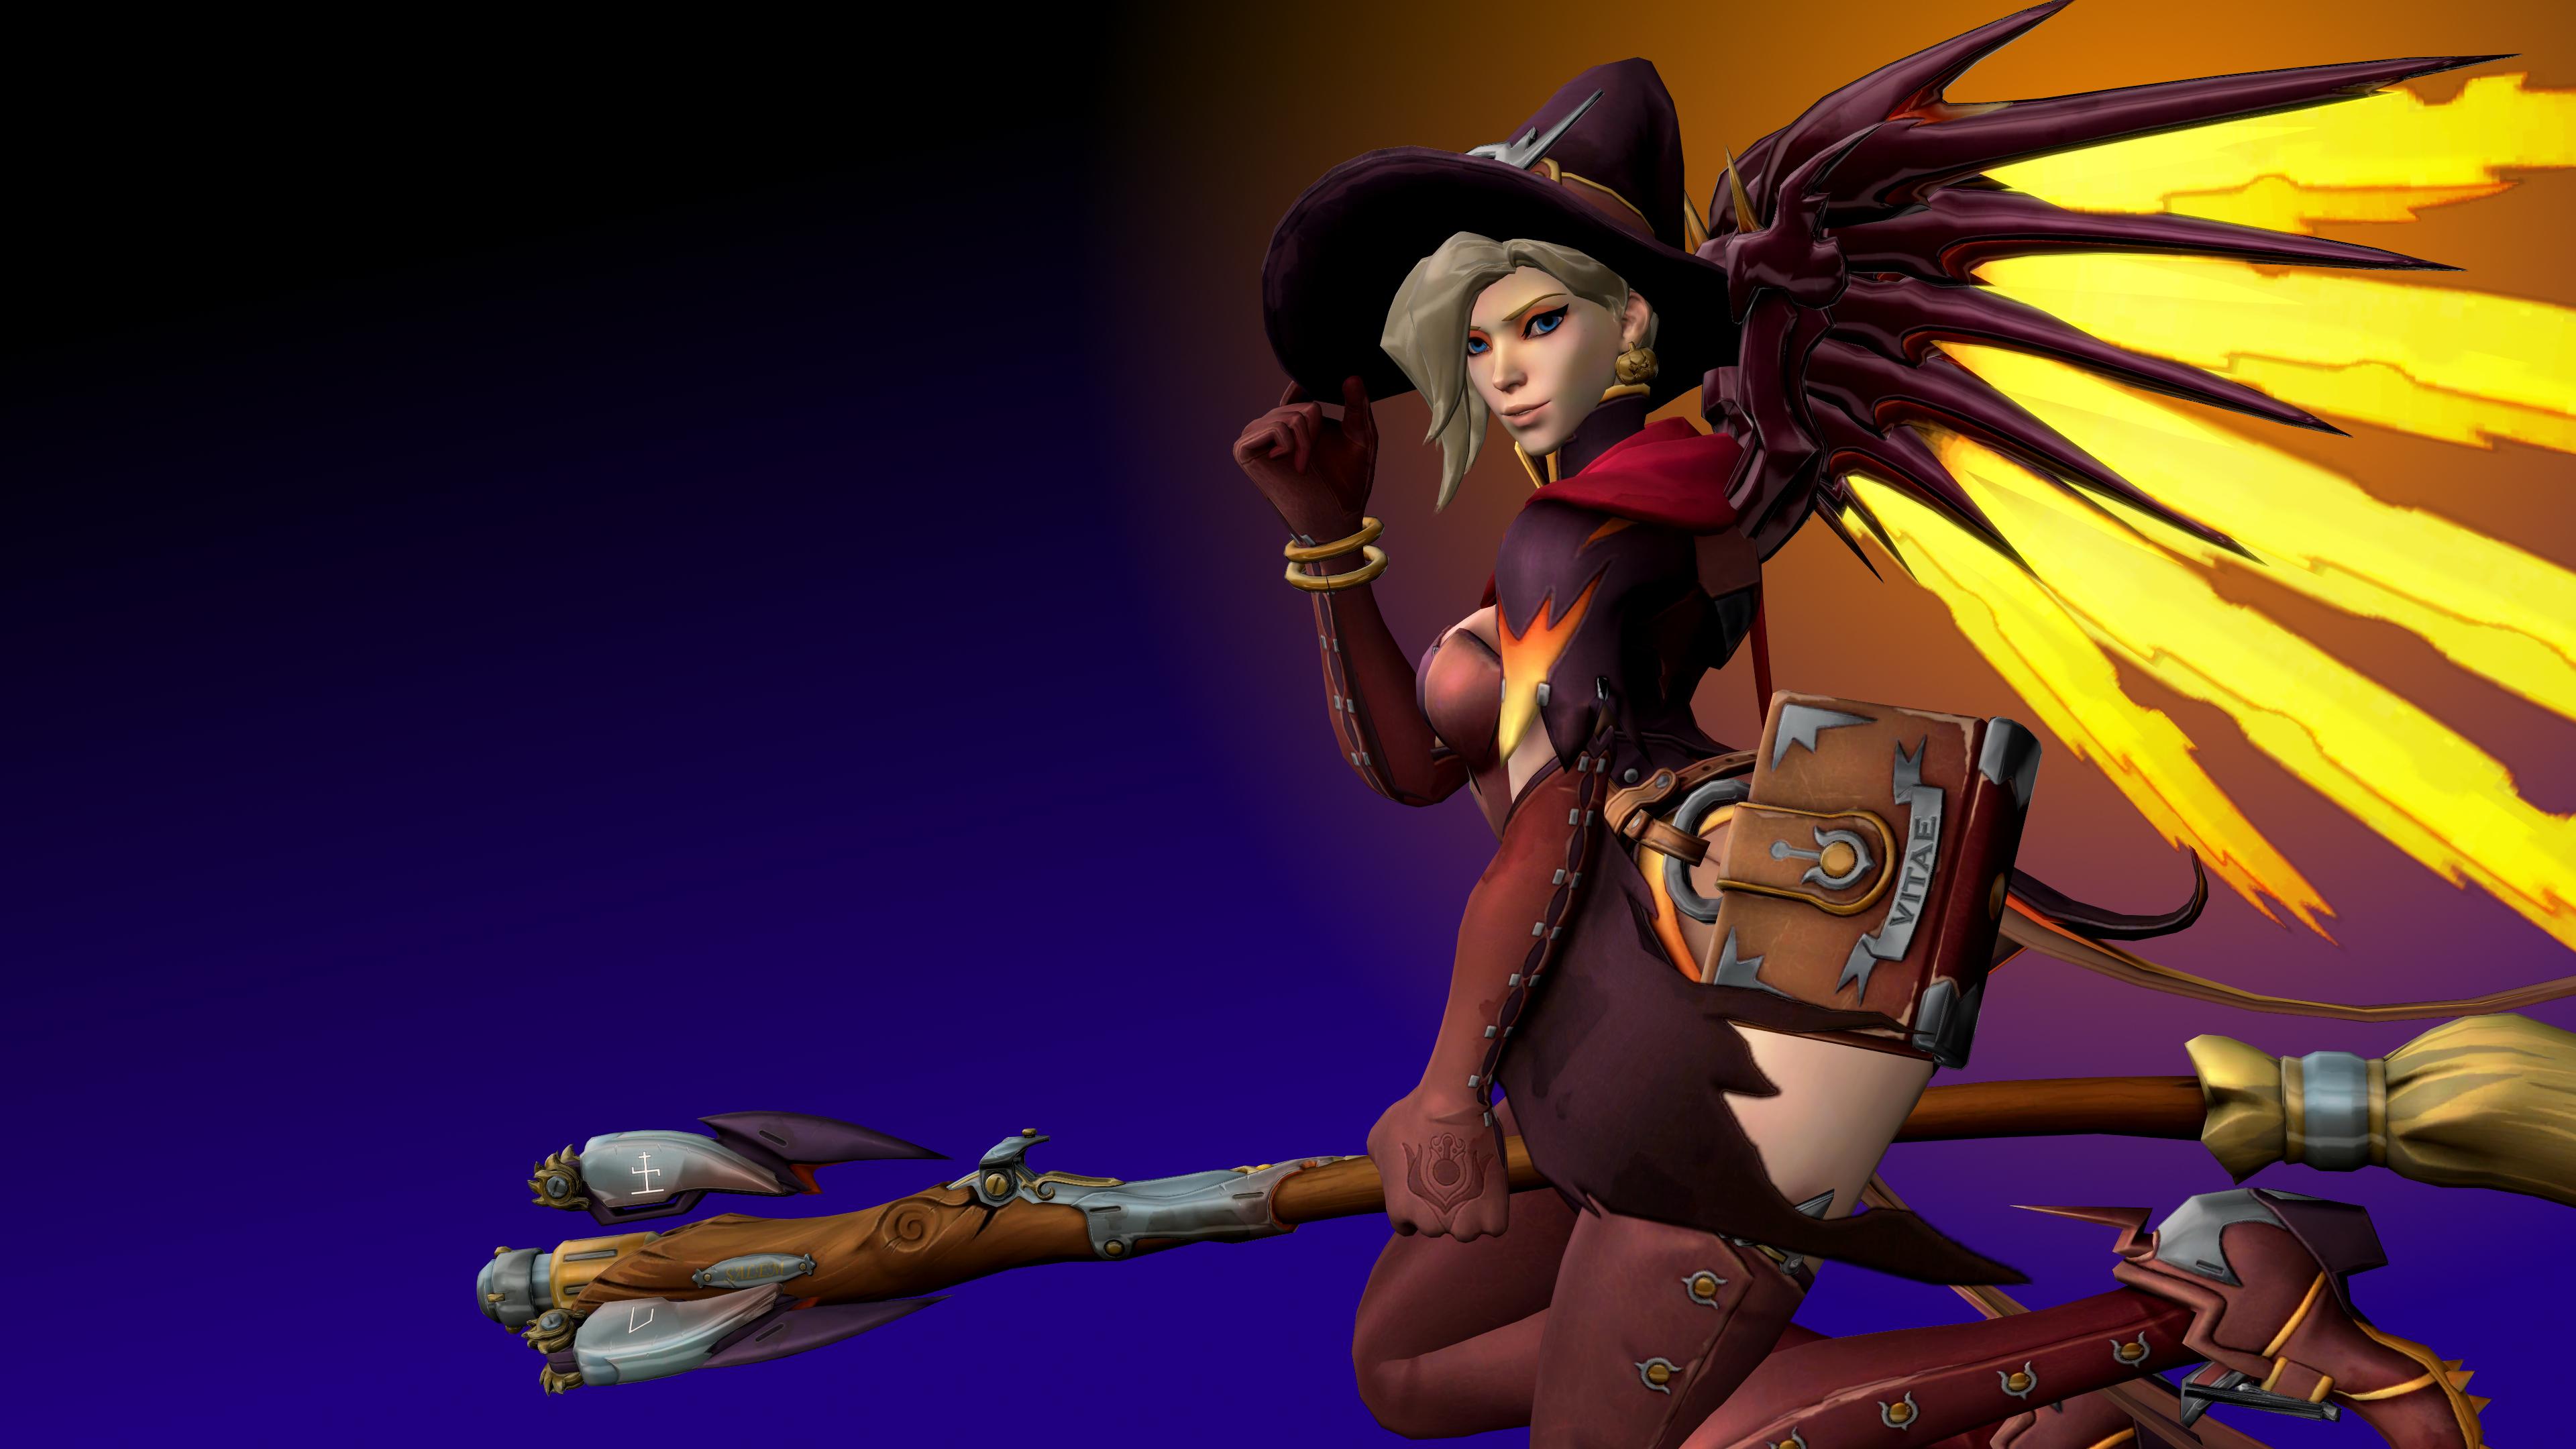 Overwatch (9d - Witch Mercy) by AdeptusInfinitus on DeviantArt